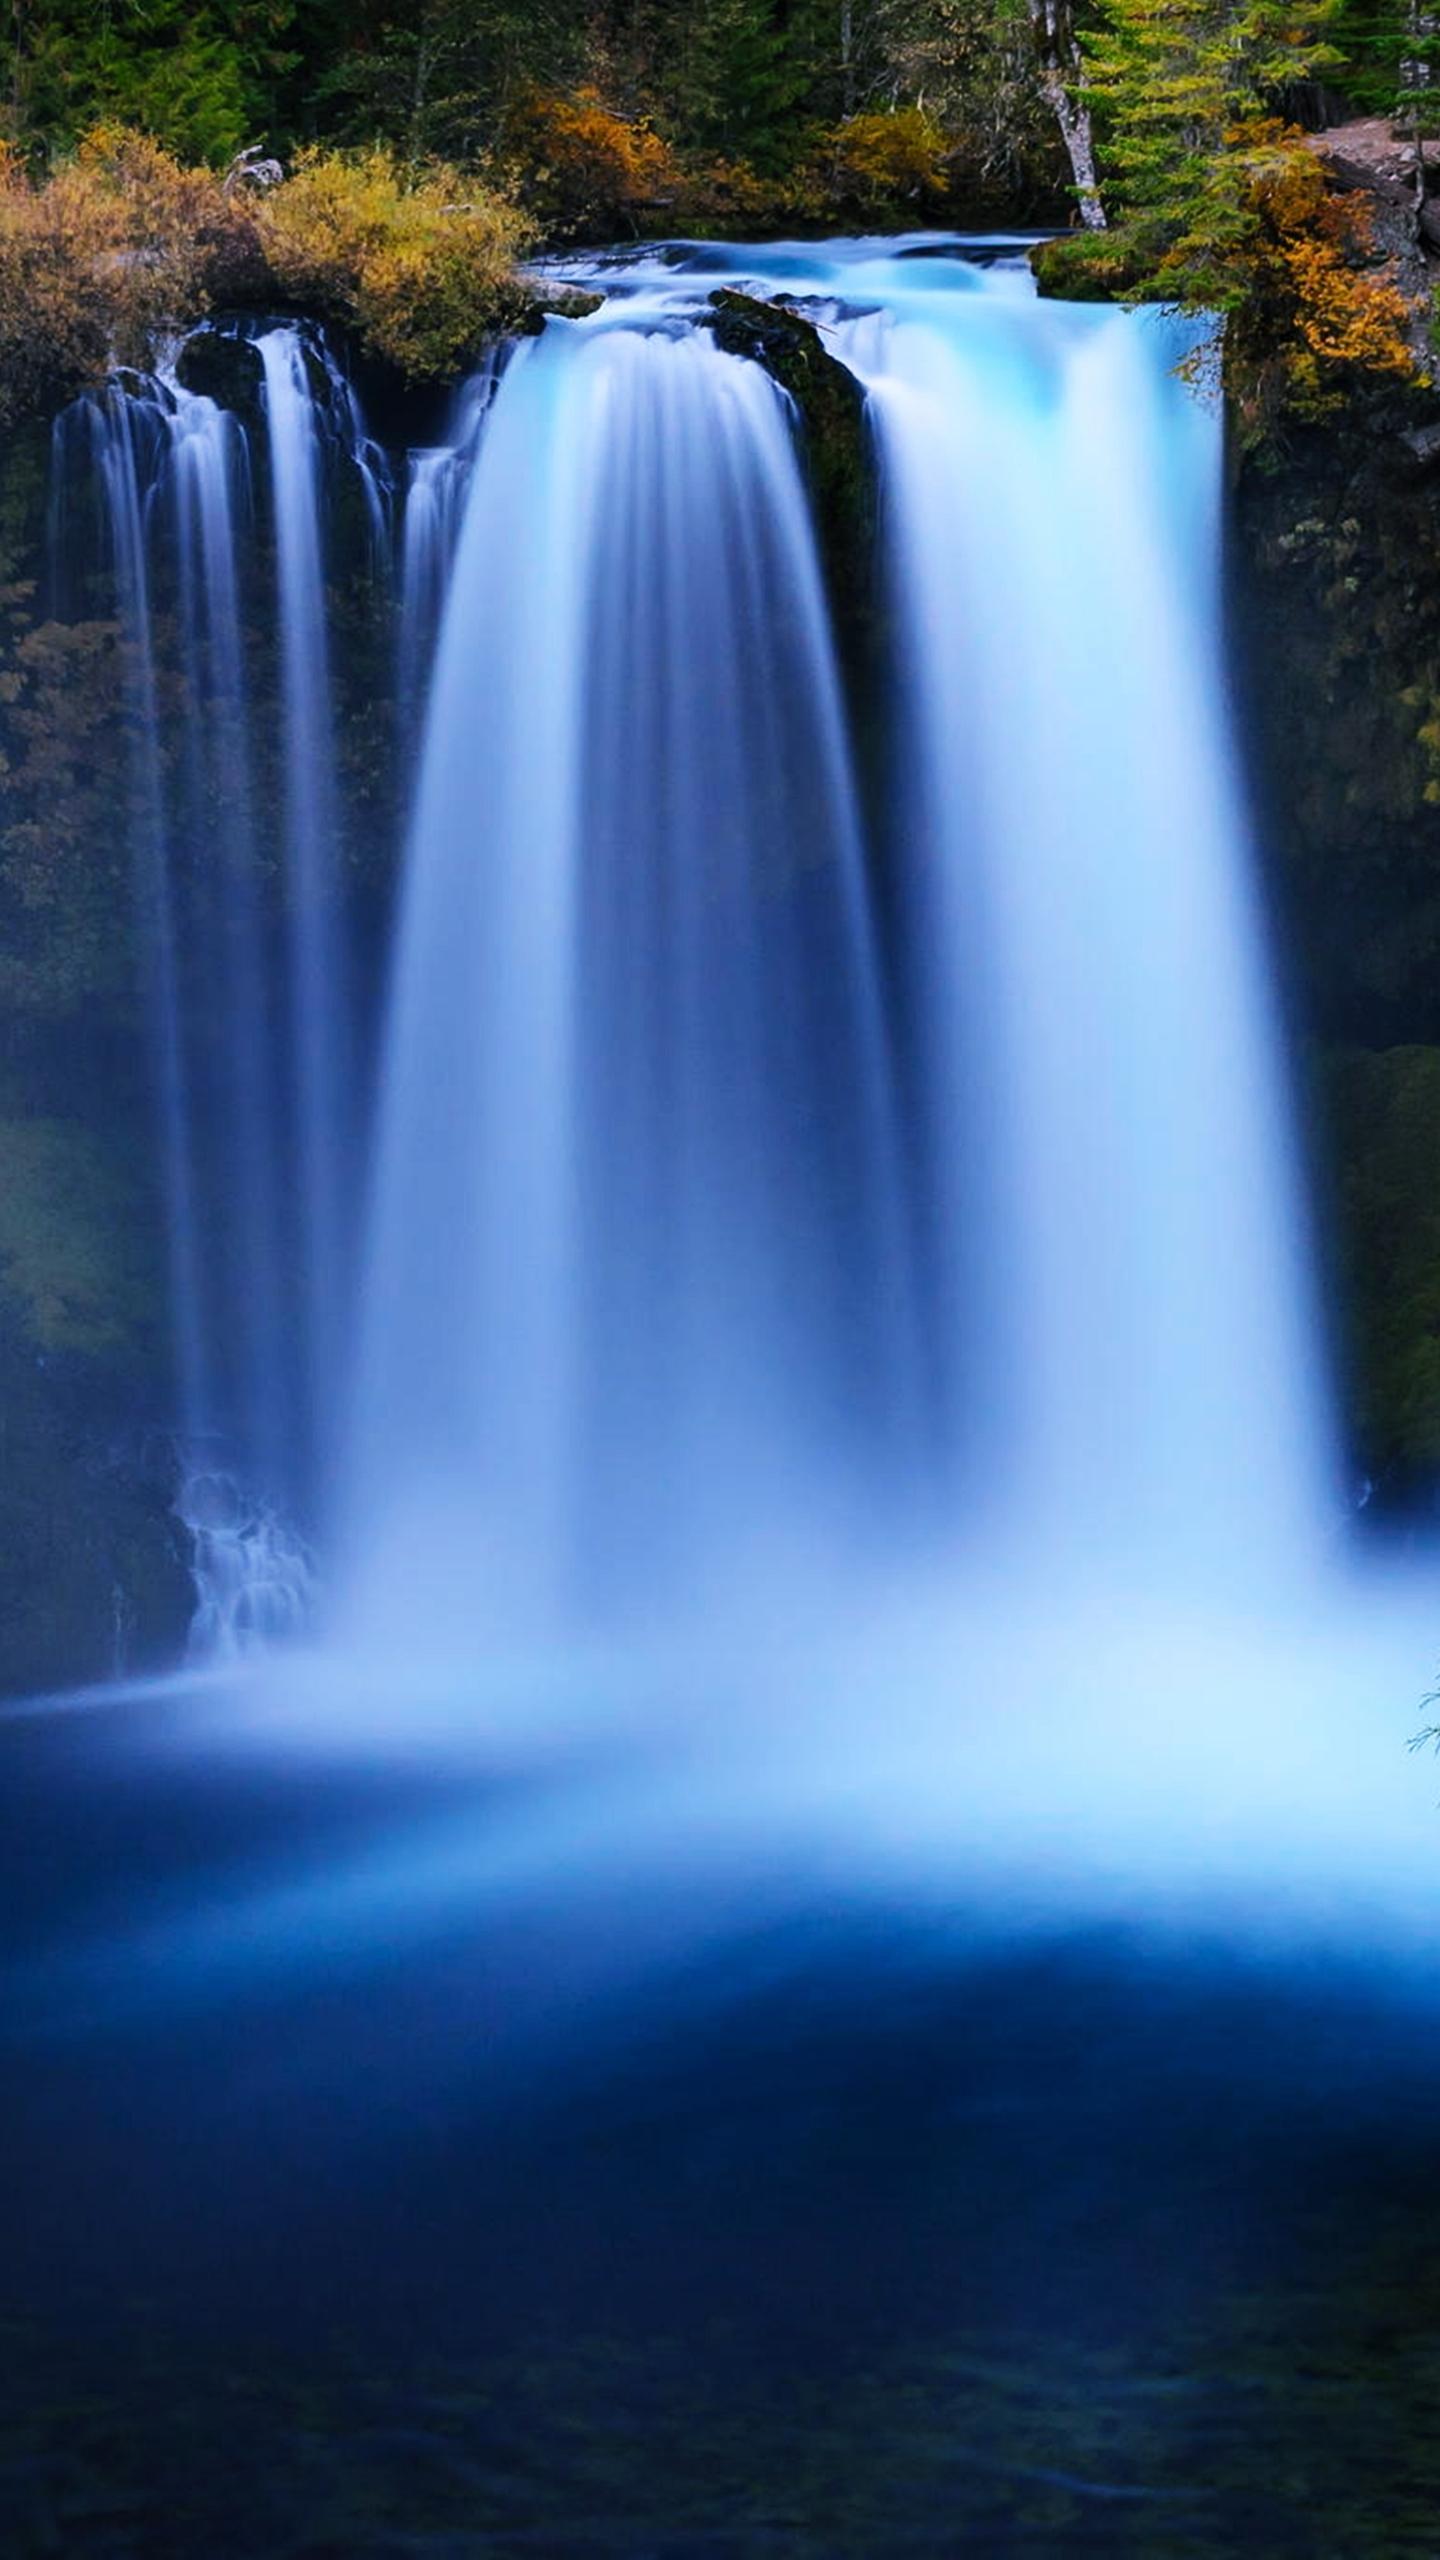 Popular Wallpaper Mobile Waterfall - 640607  Best Photo Reference_518343.jpg